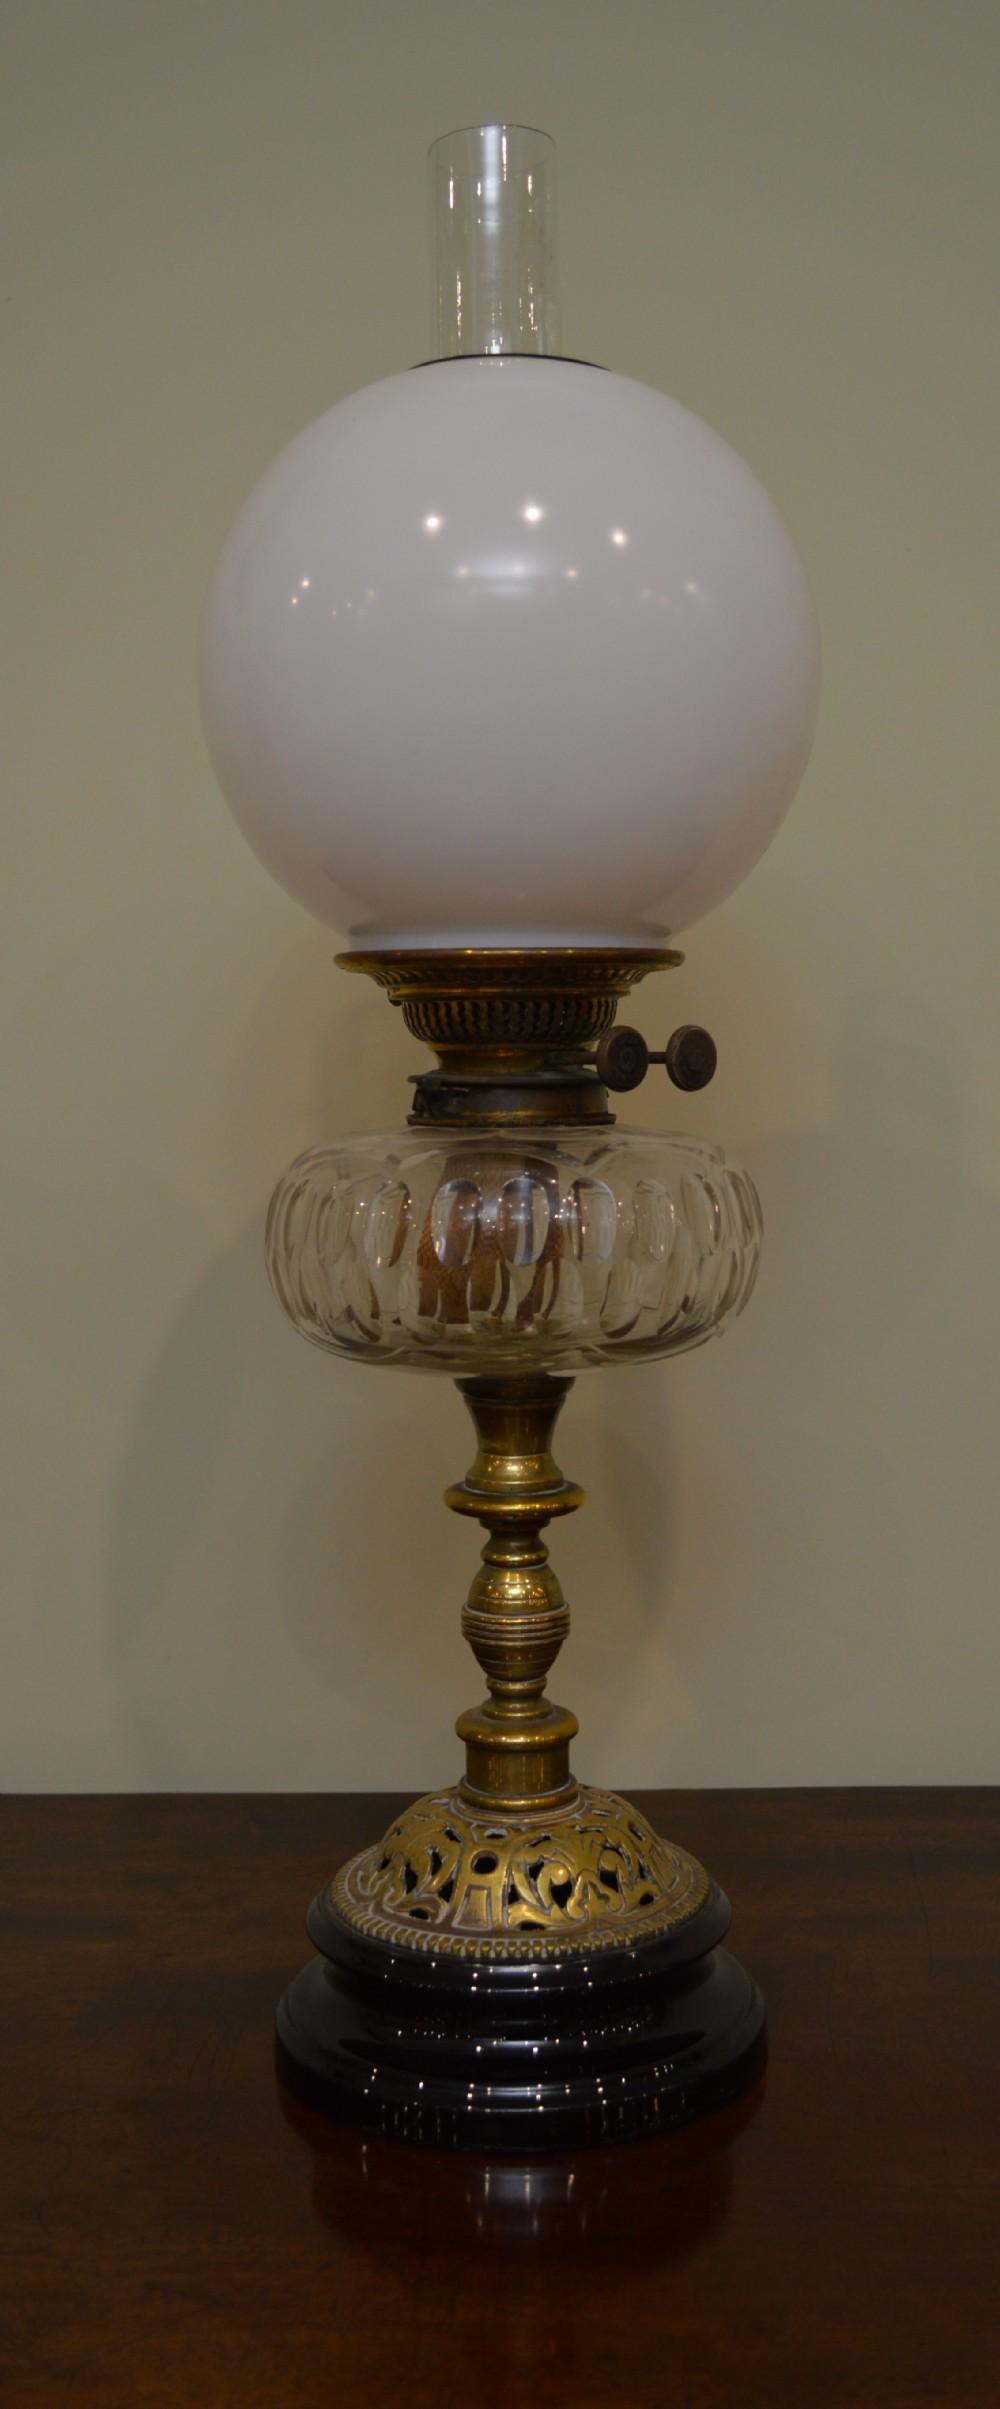 10 Benefits Of Antique Globe Lamps Warisan Lighting